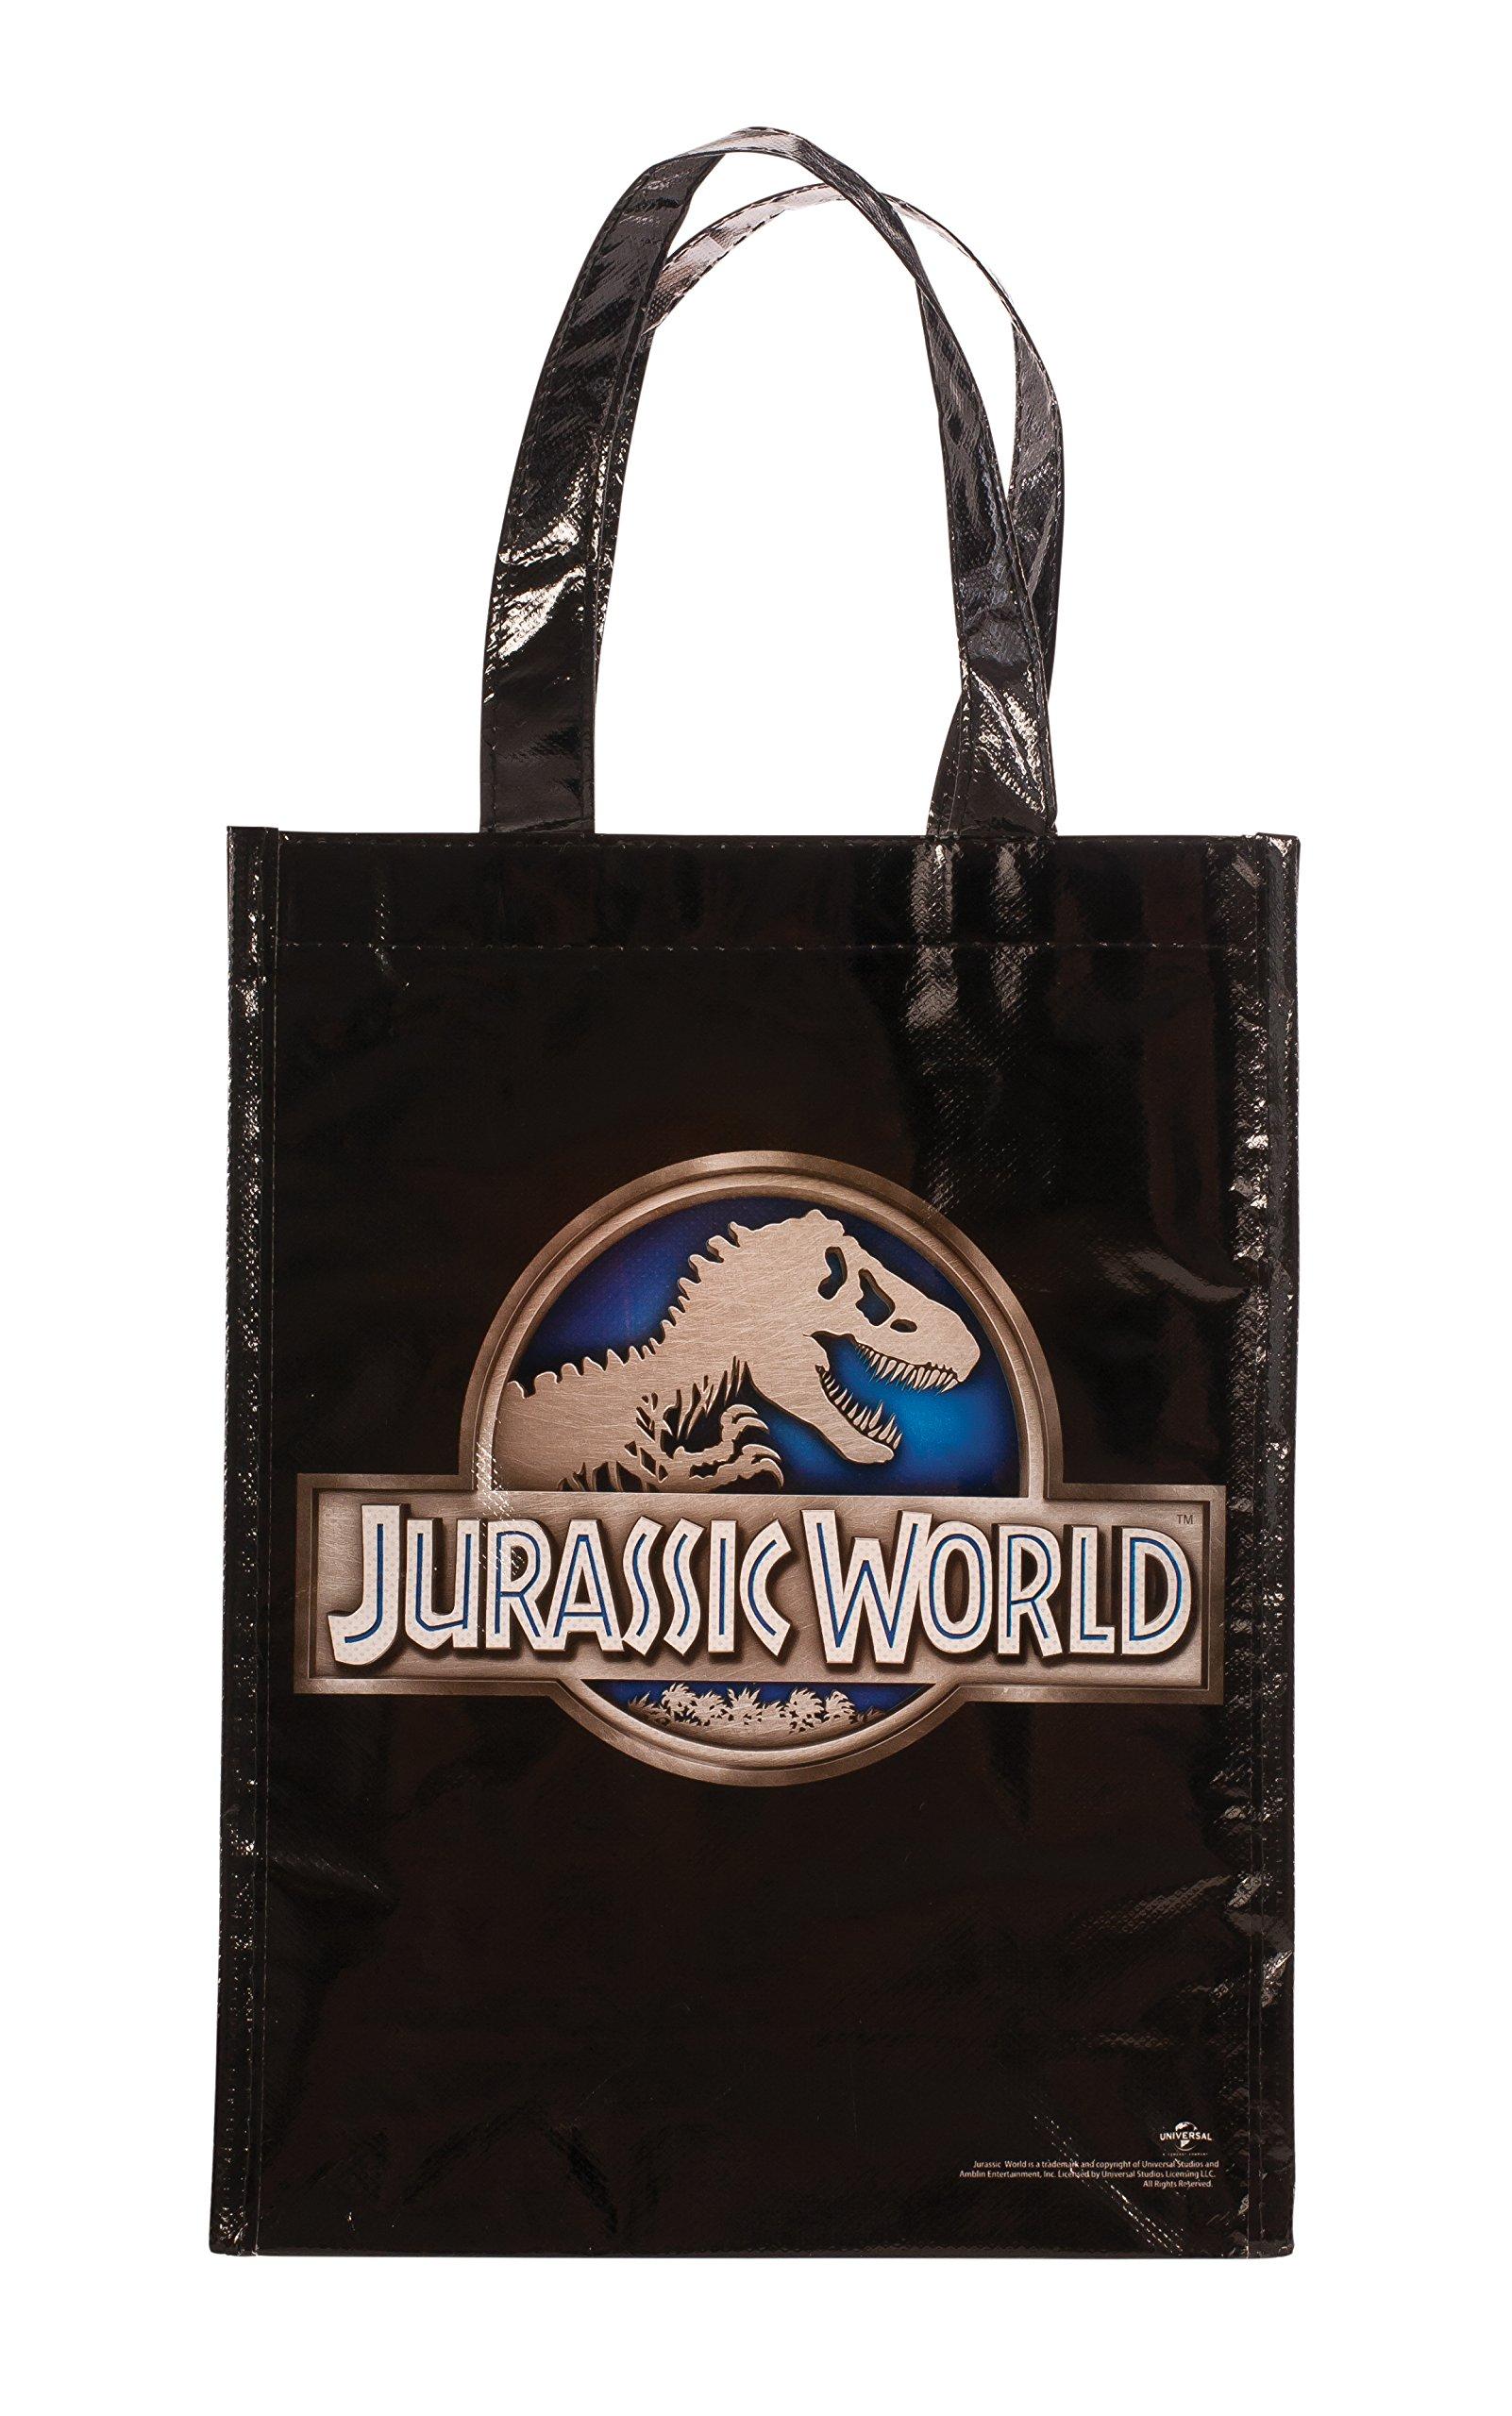 Rubie's Costume Jurassic World Trick Treat Canvas Bag Costume